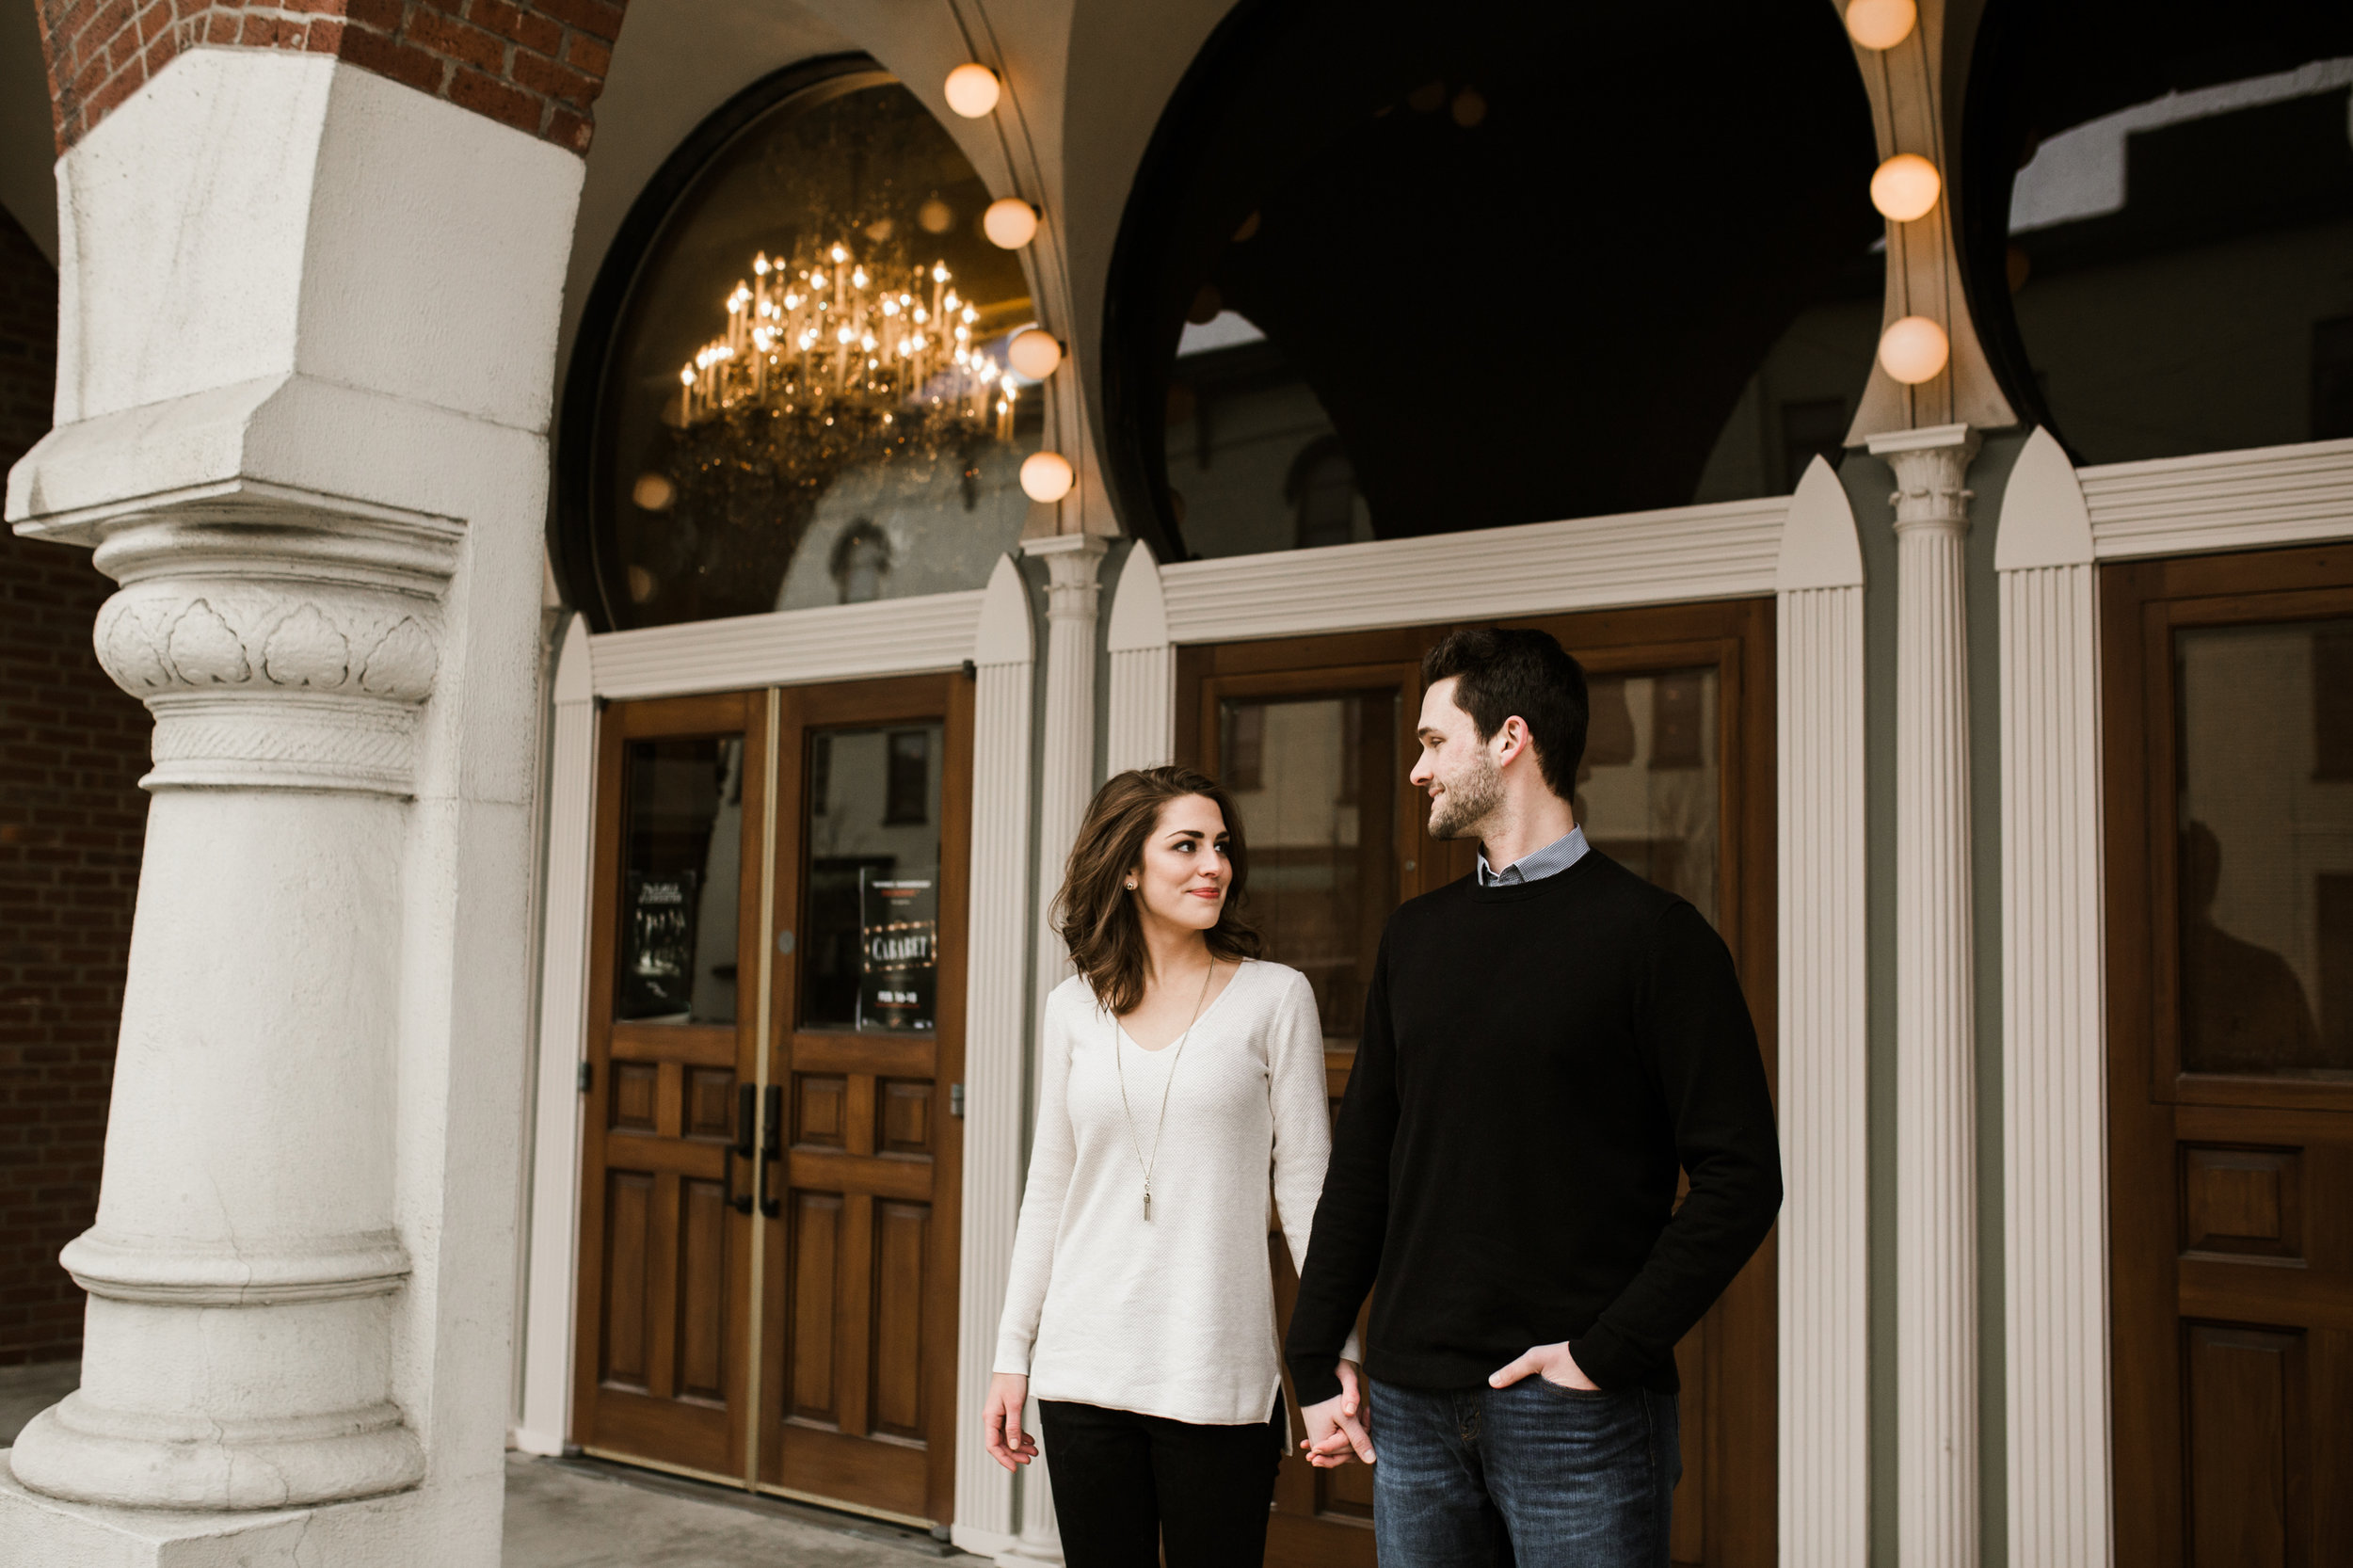 Ellen & Lee Engagement 2018 WEBSITE SP Crystal Ludwick Photo (48 of 54).jpg